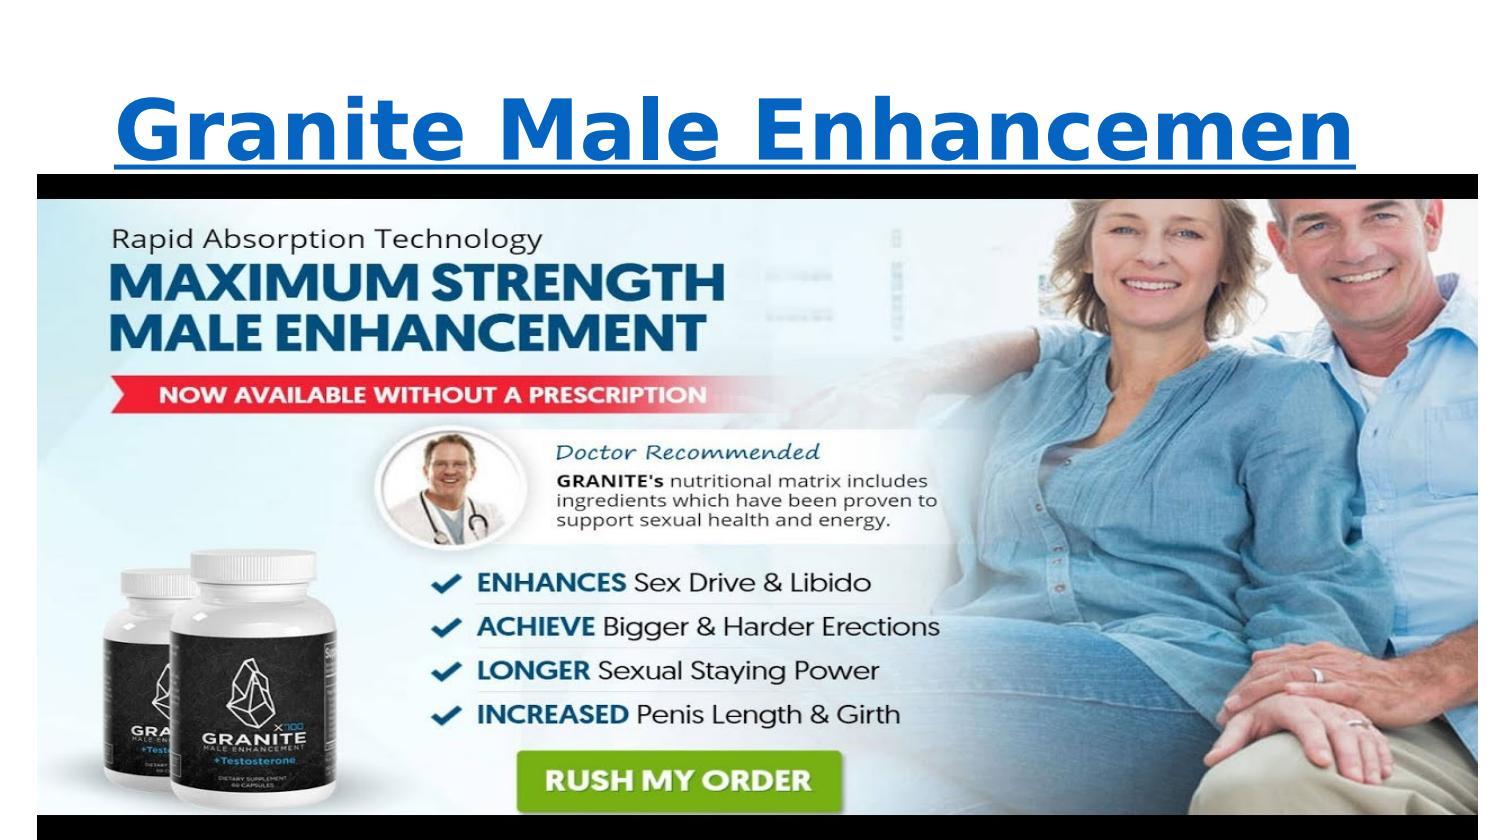 https://supplementrange.com/testosterone-range/granite-male-enhancement/ by  Supplement Range - issuu